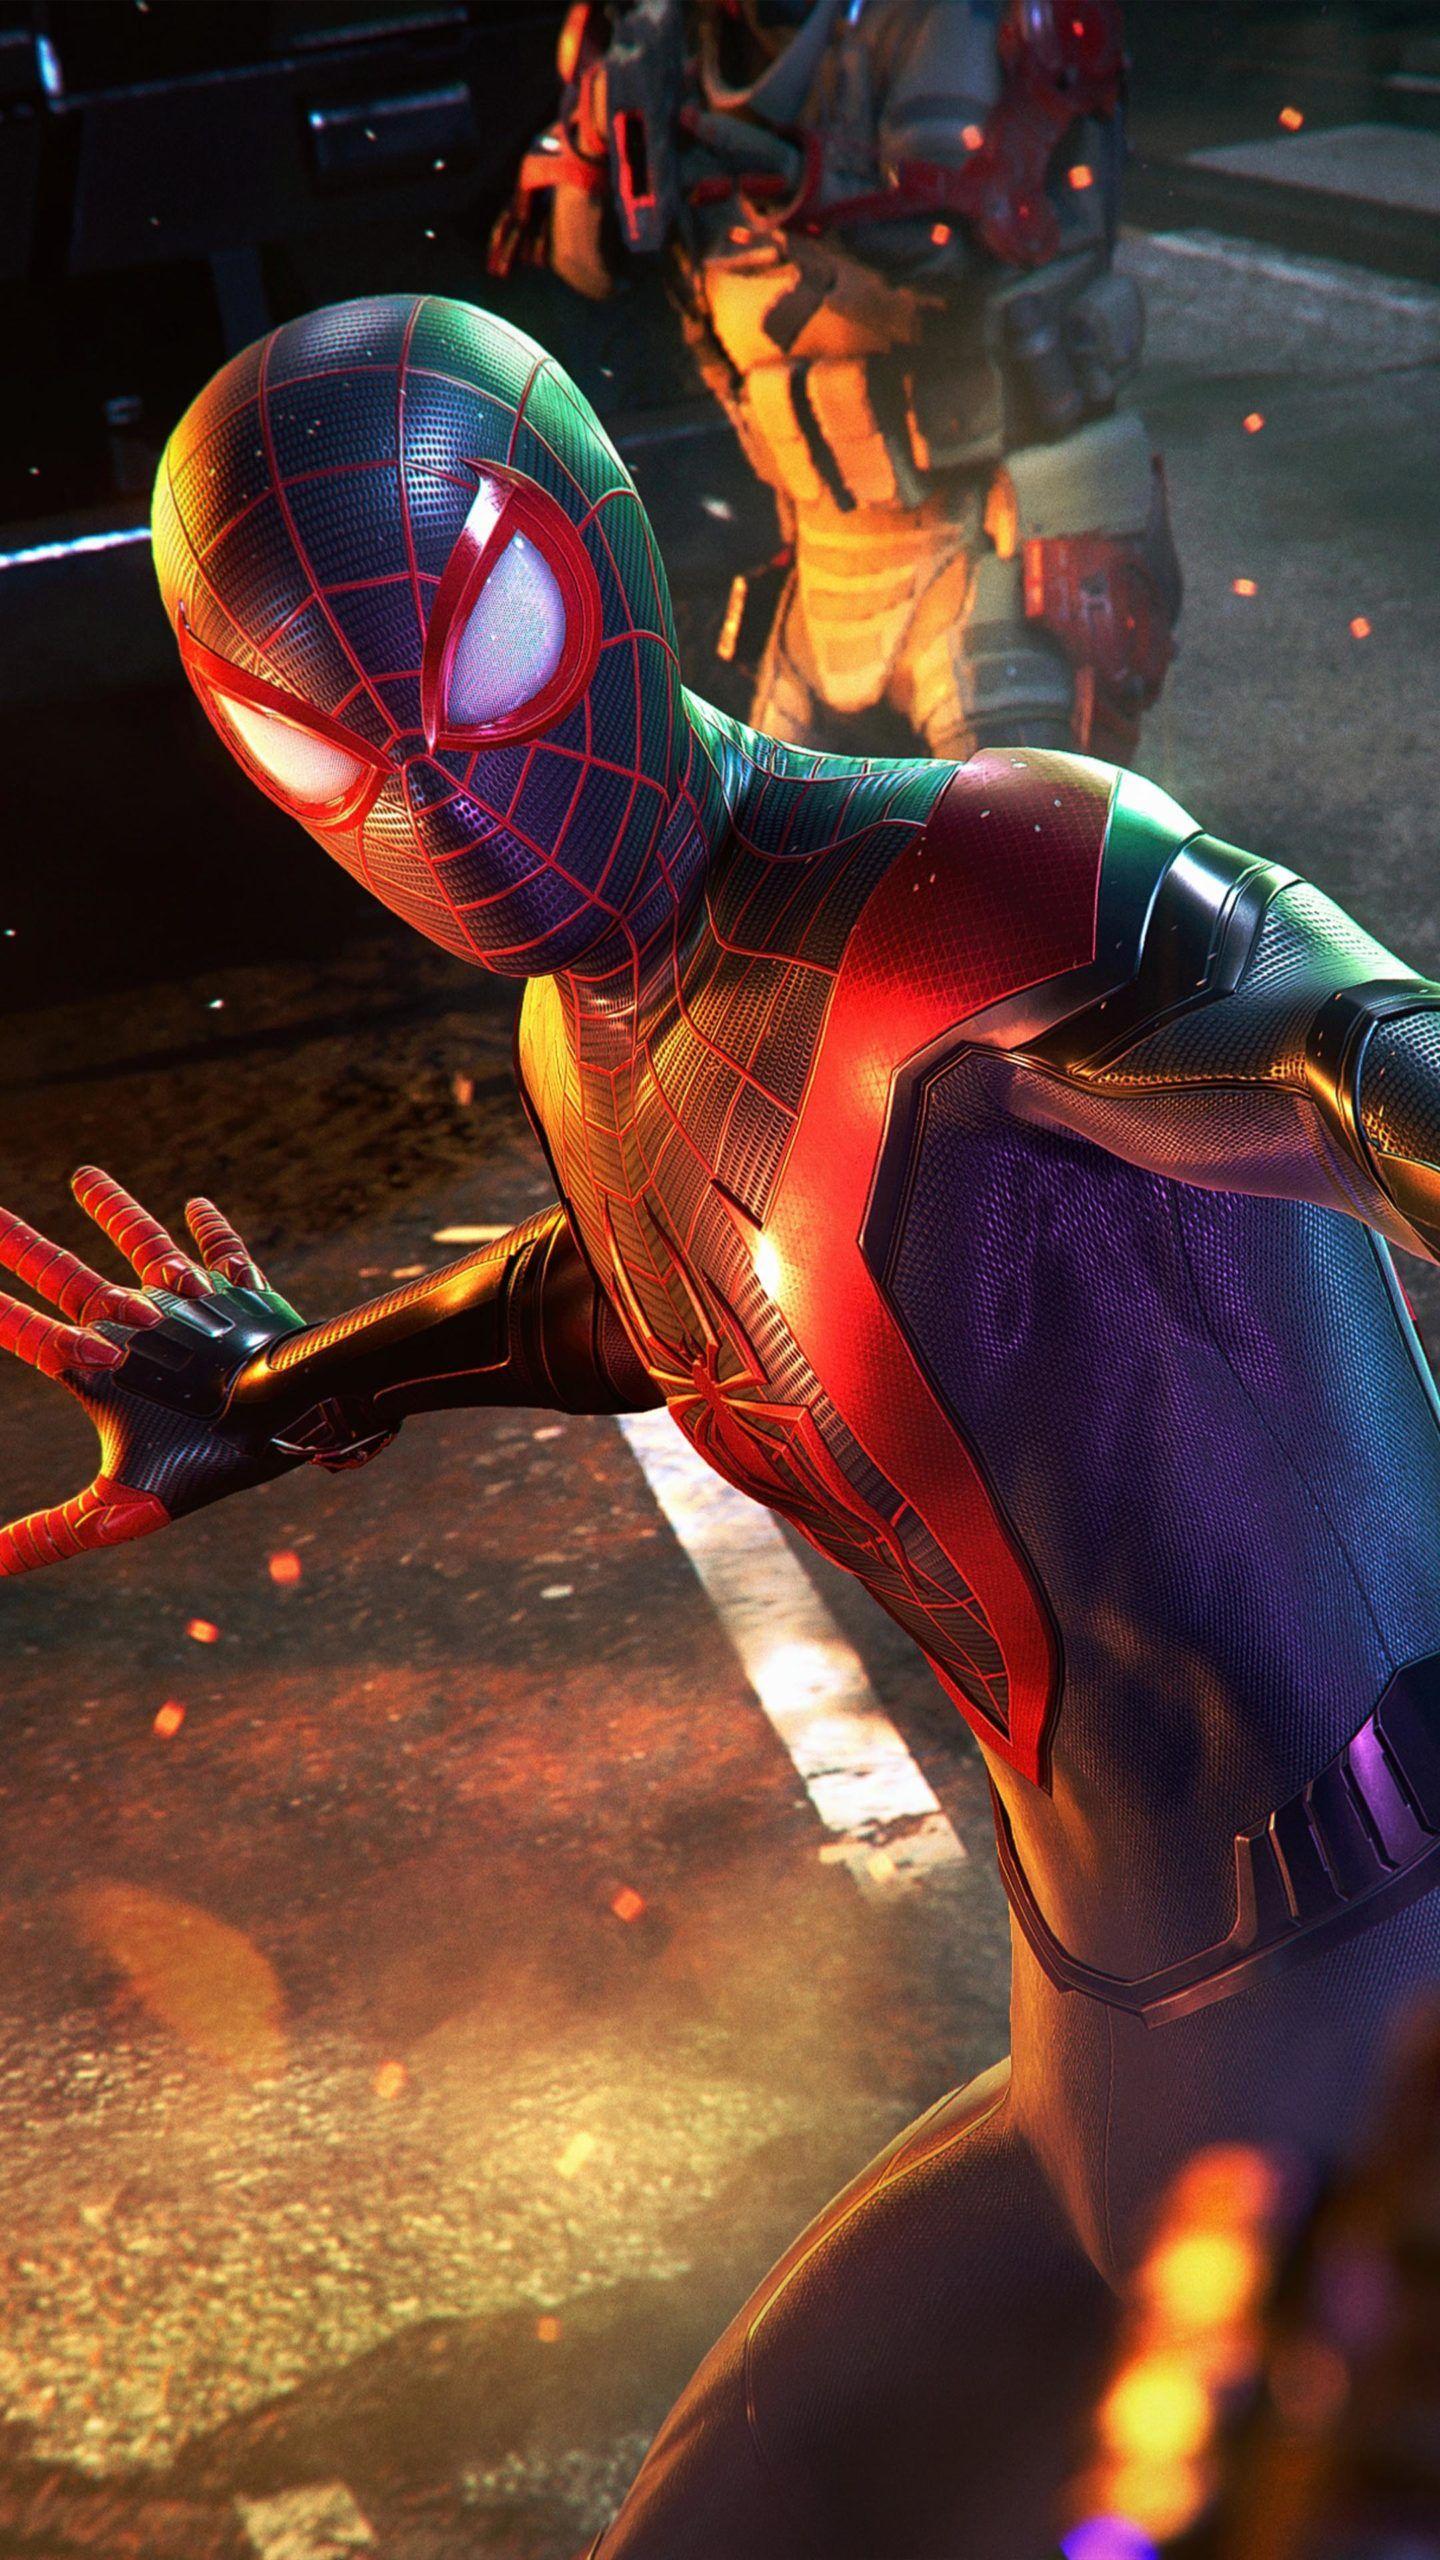 Marvel's Spiderman Miles Morales 4K Ultra HD Mobile